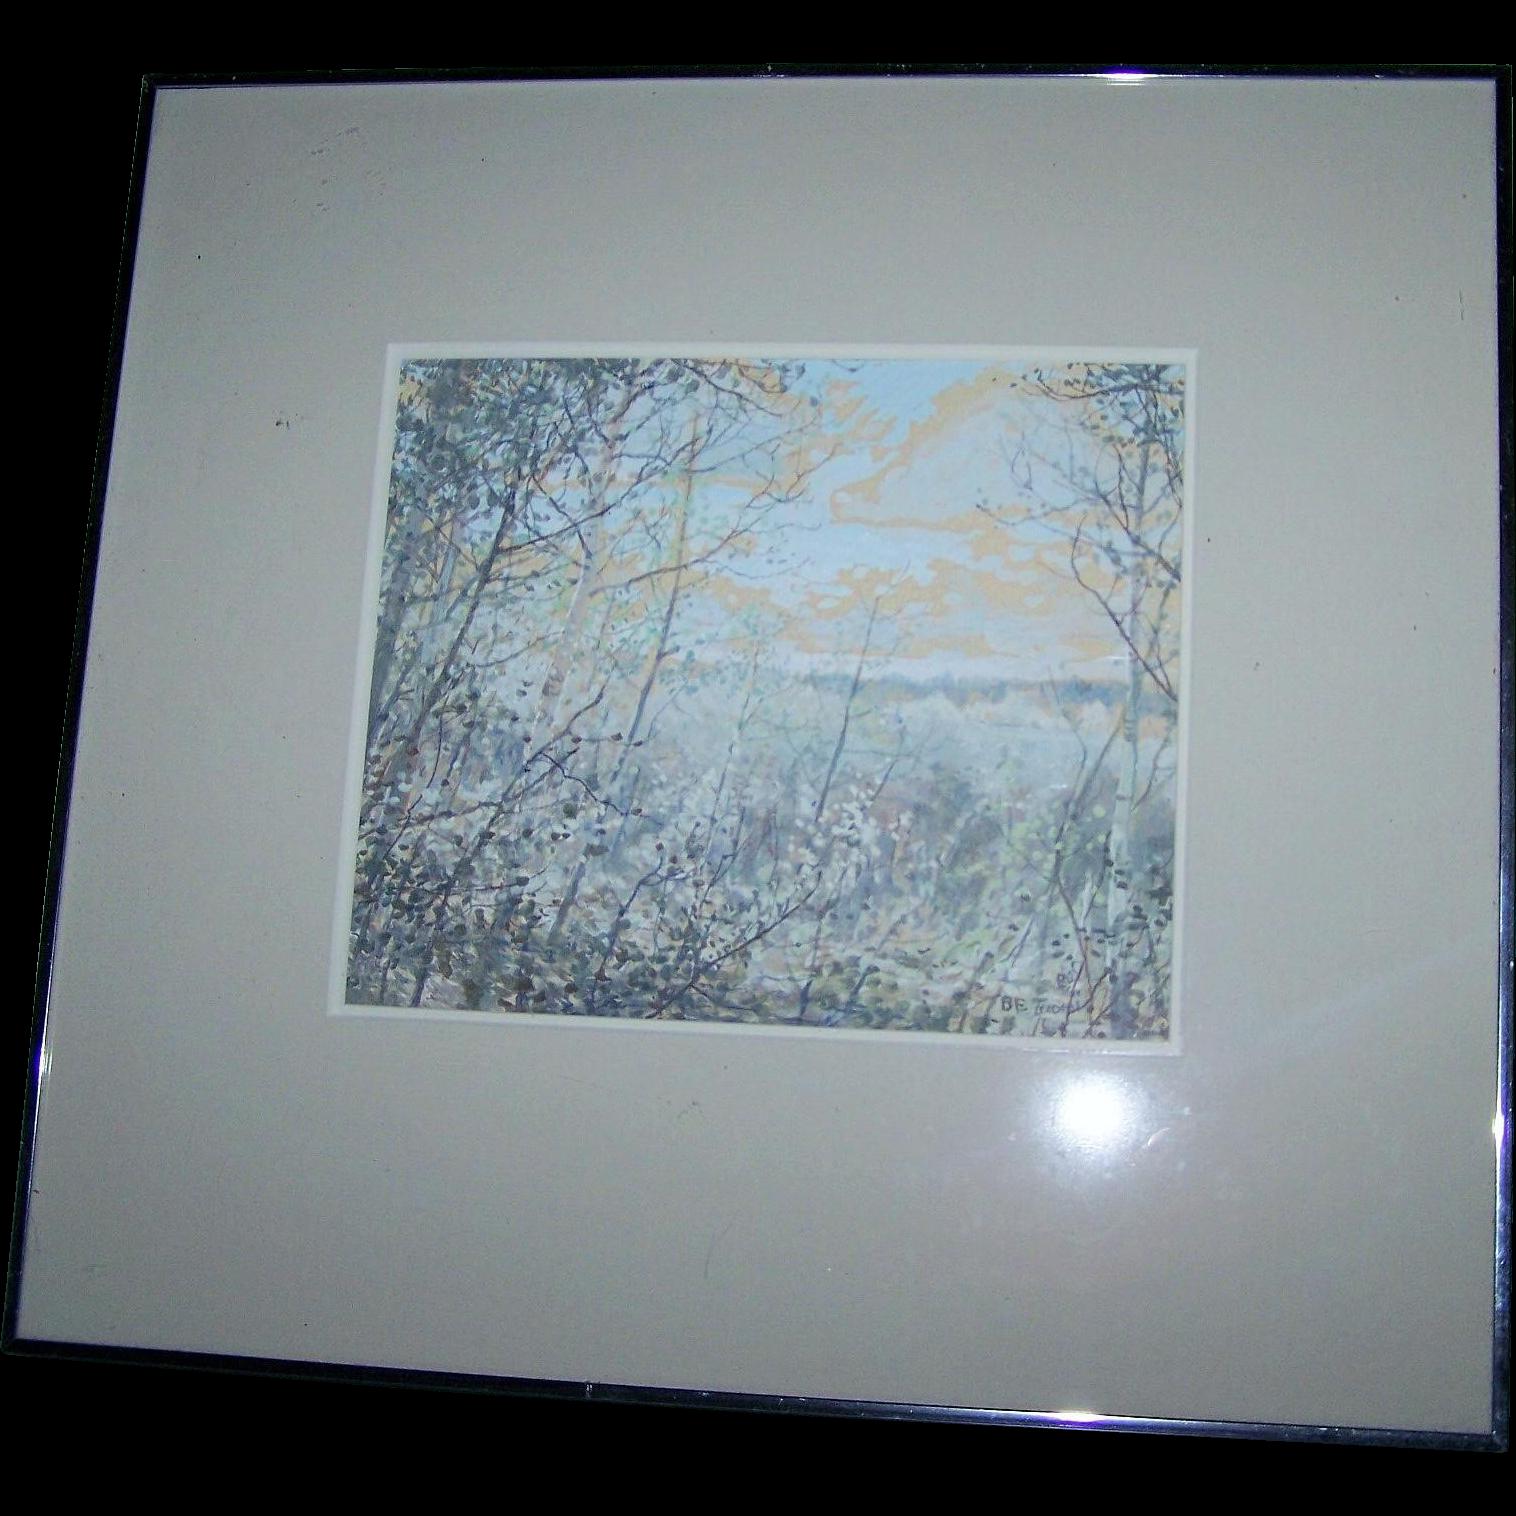 Framed Scenic Birch Tree Water Media Painting Gouache